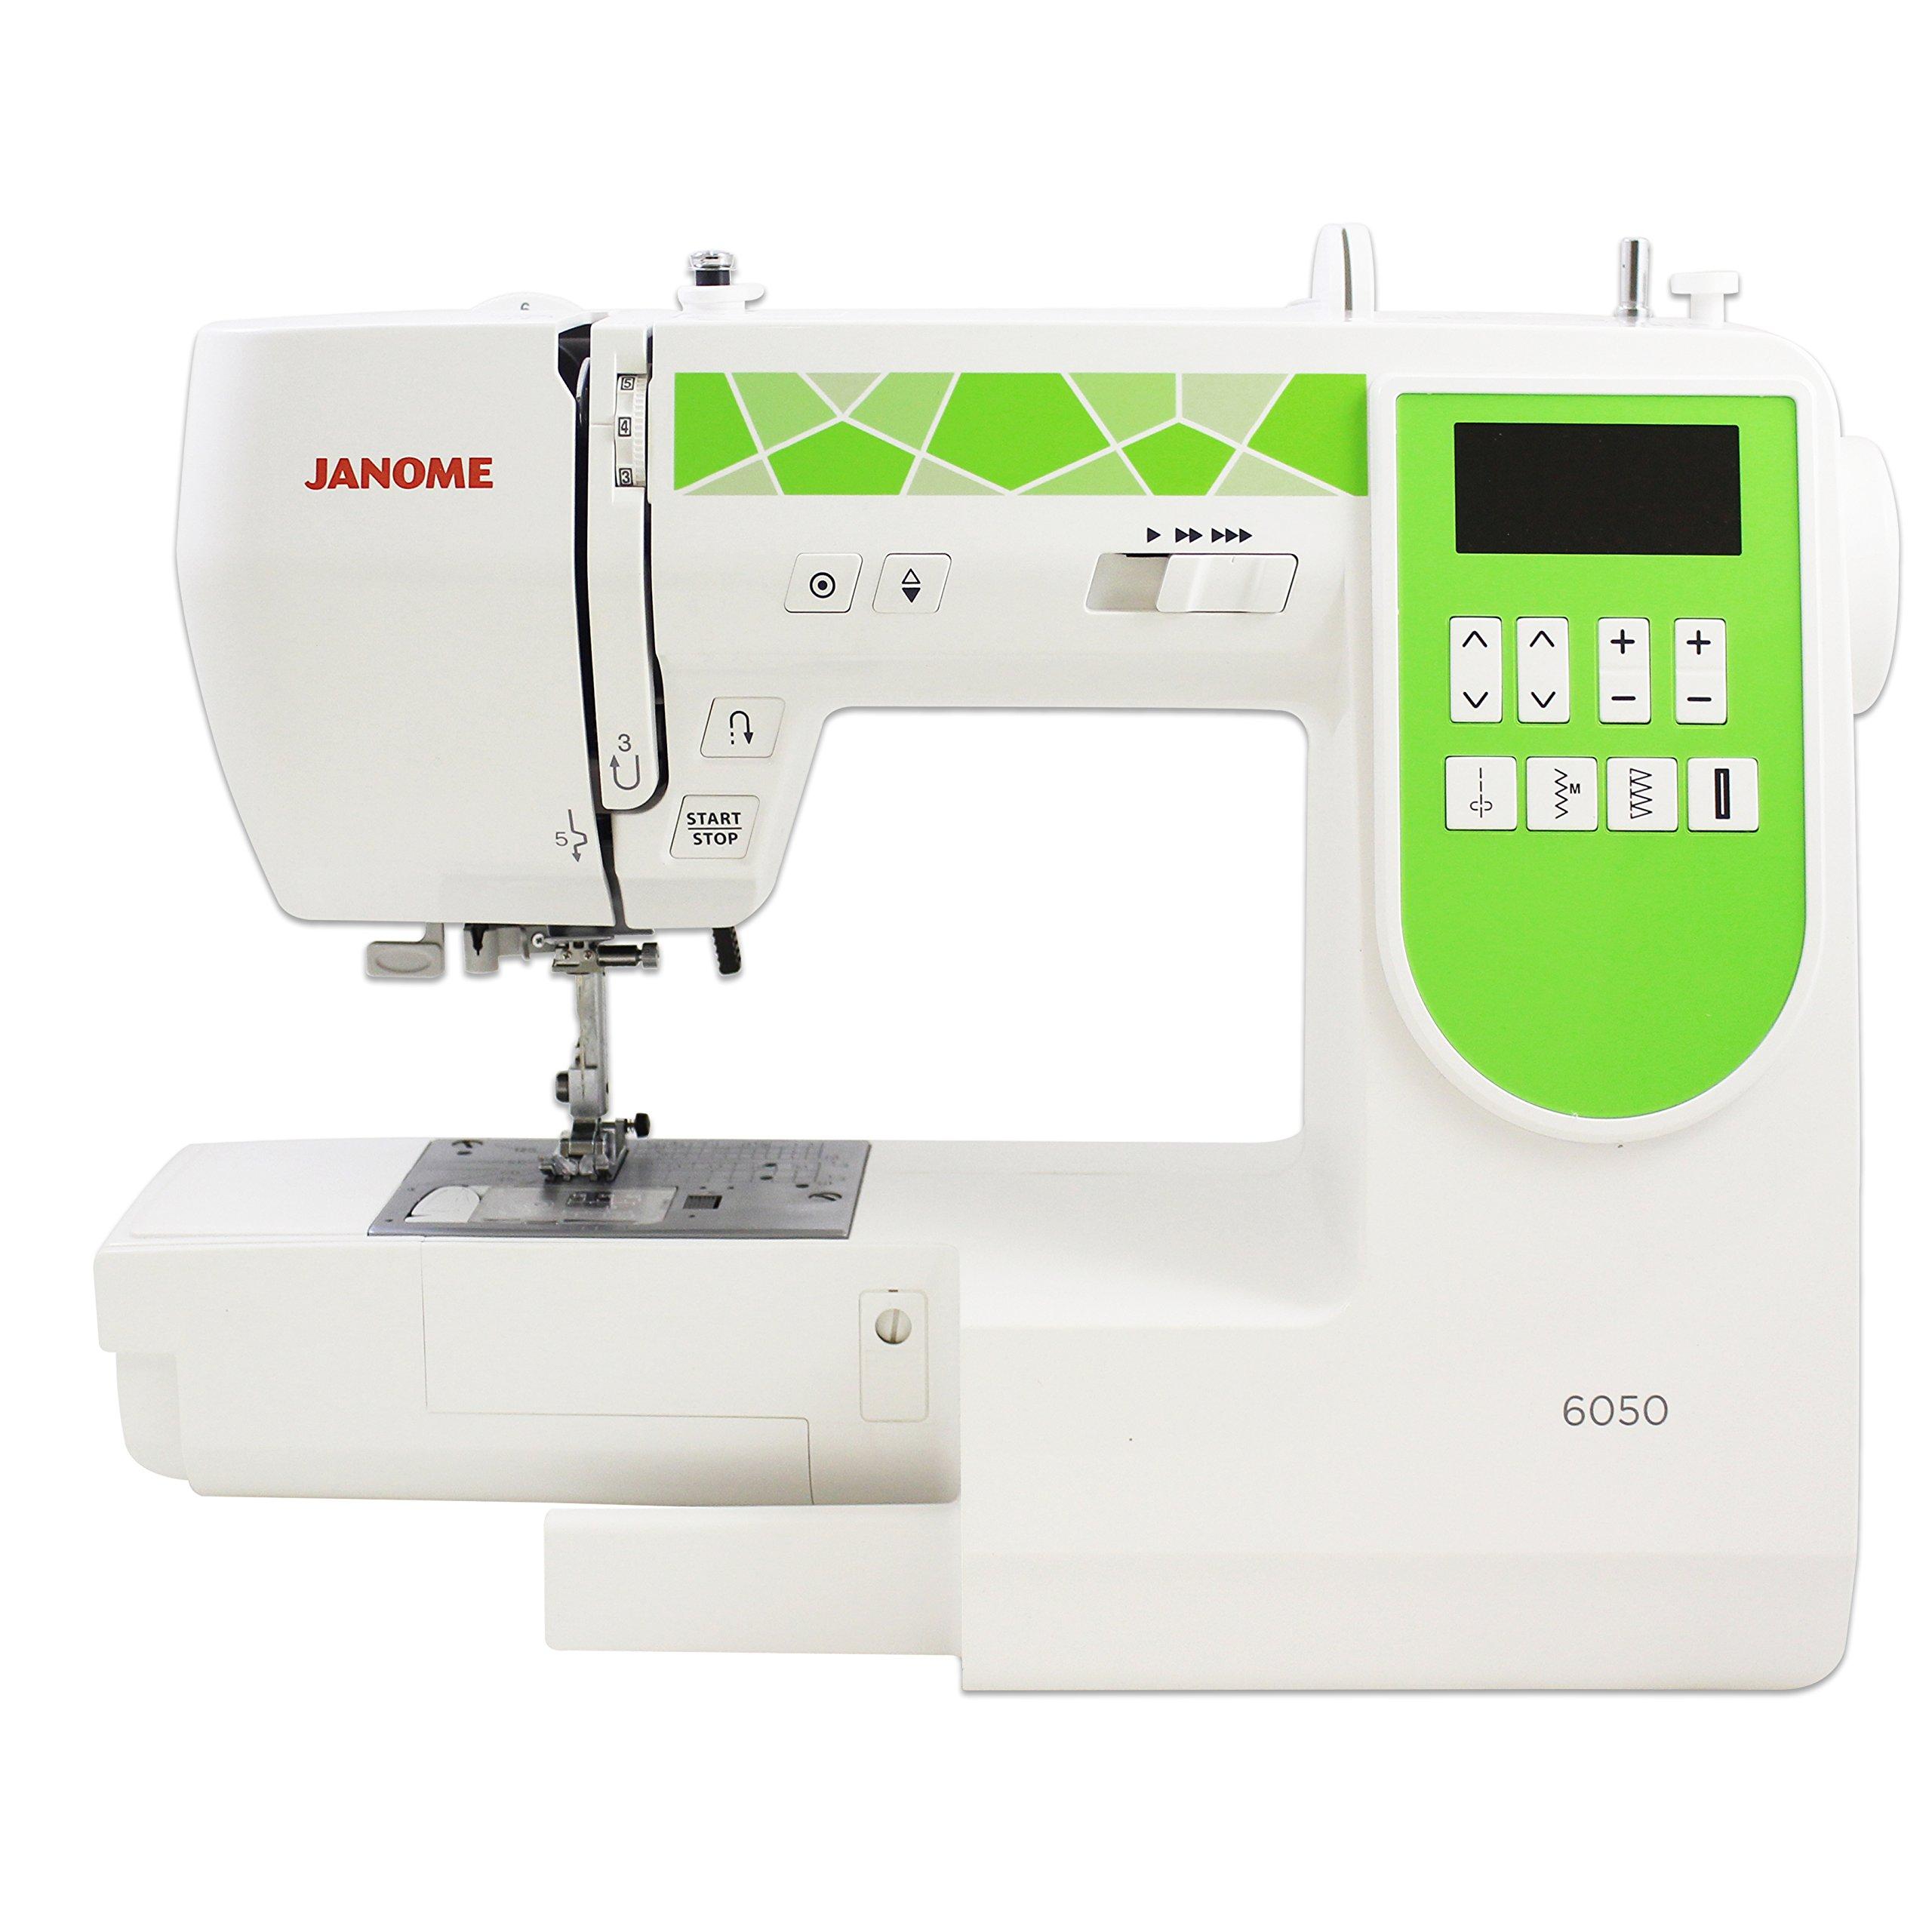 Janome 6050 máquina de coser computarizada con exclusivo paquete ...